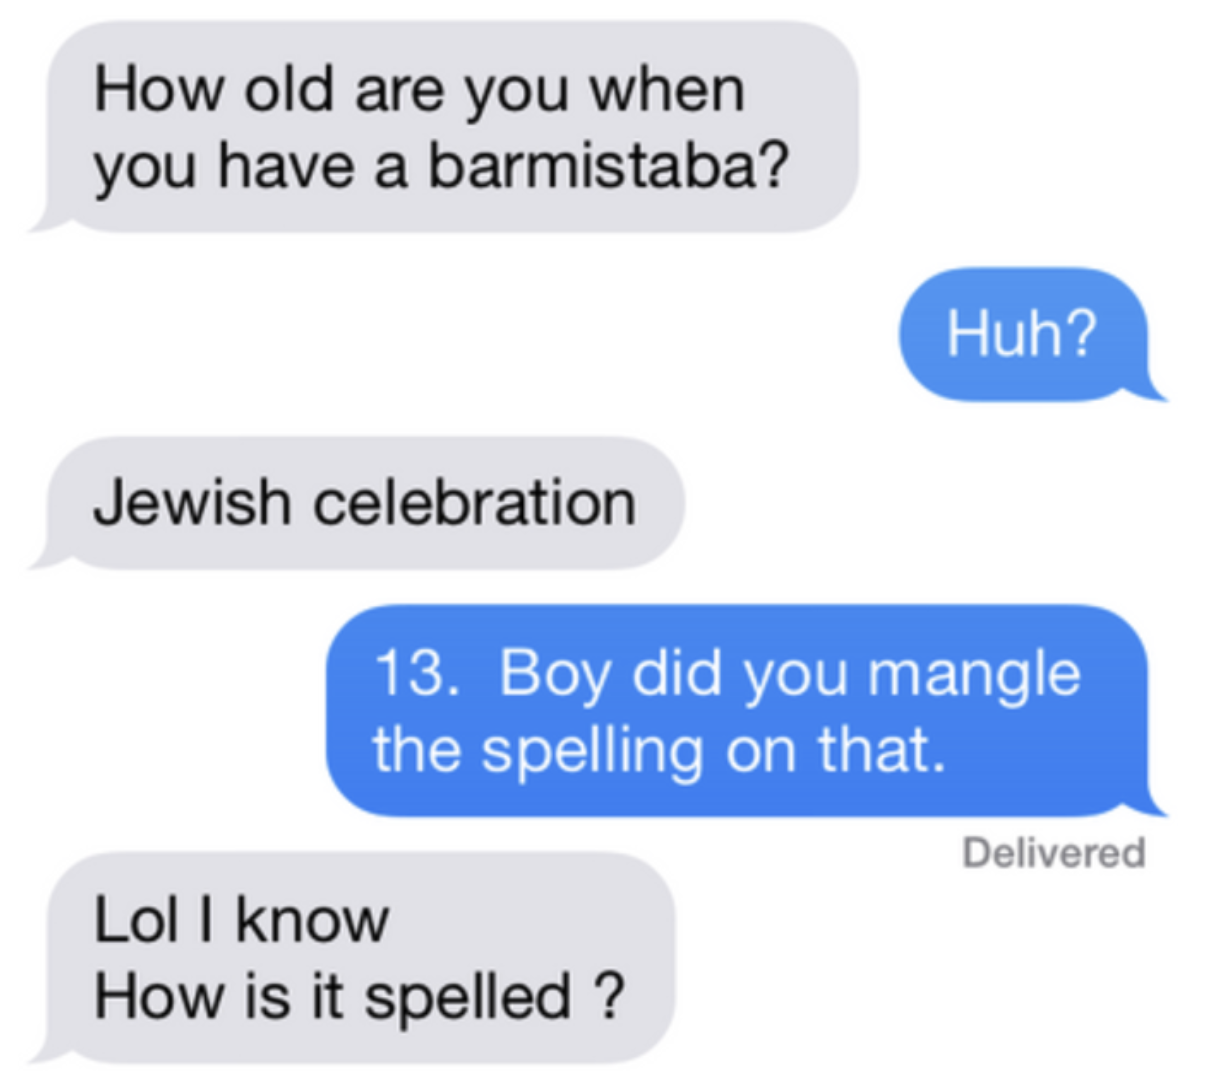 text where one person misspells bar-mitzfah as barmistaba